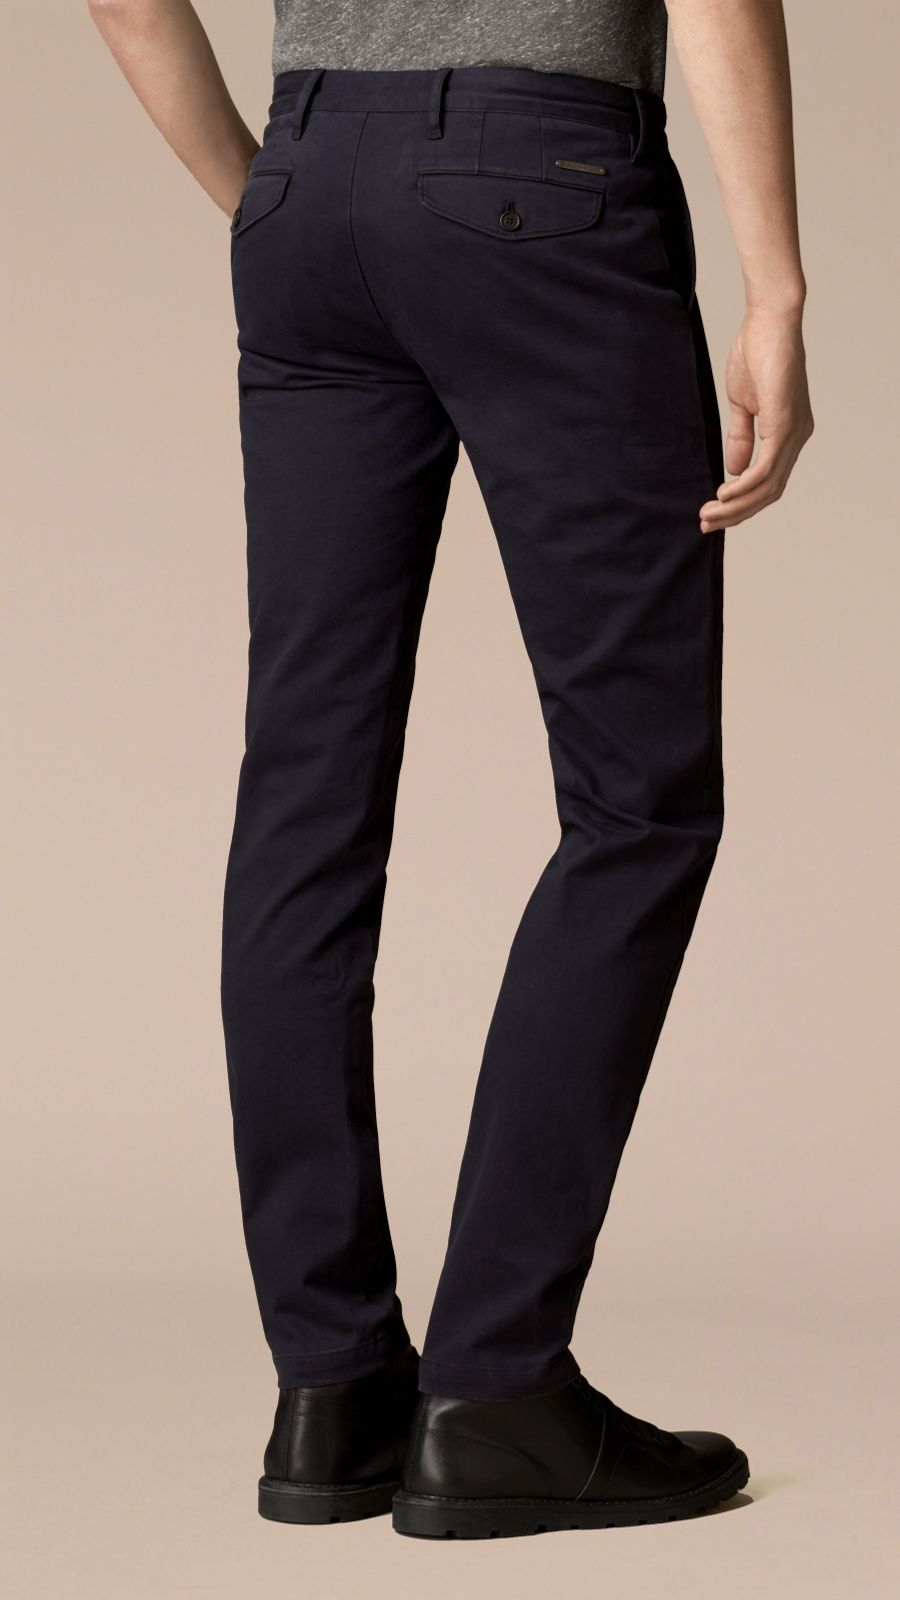 Navy Slim Fit Stretch-Cotton Twill Chinos Navy - Image 2